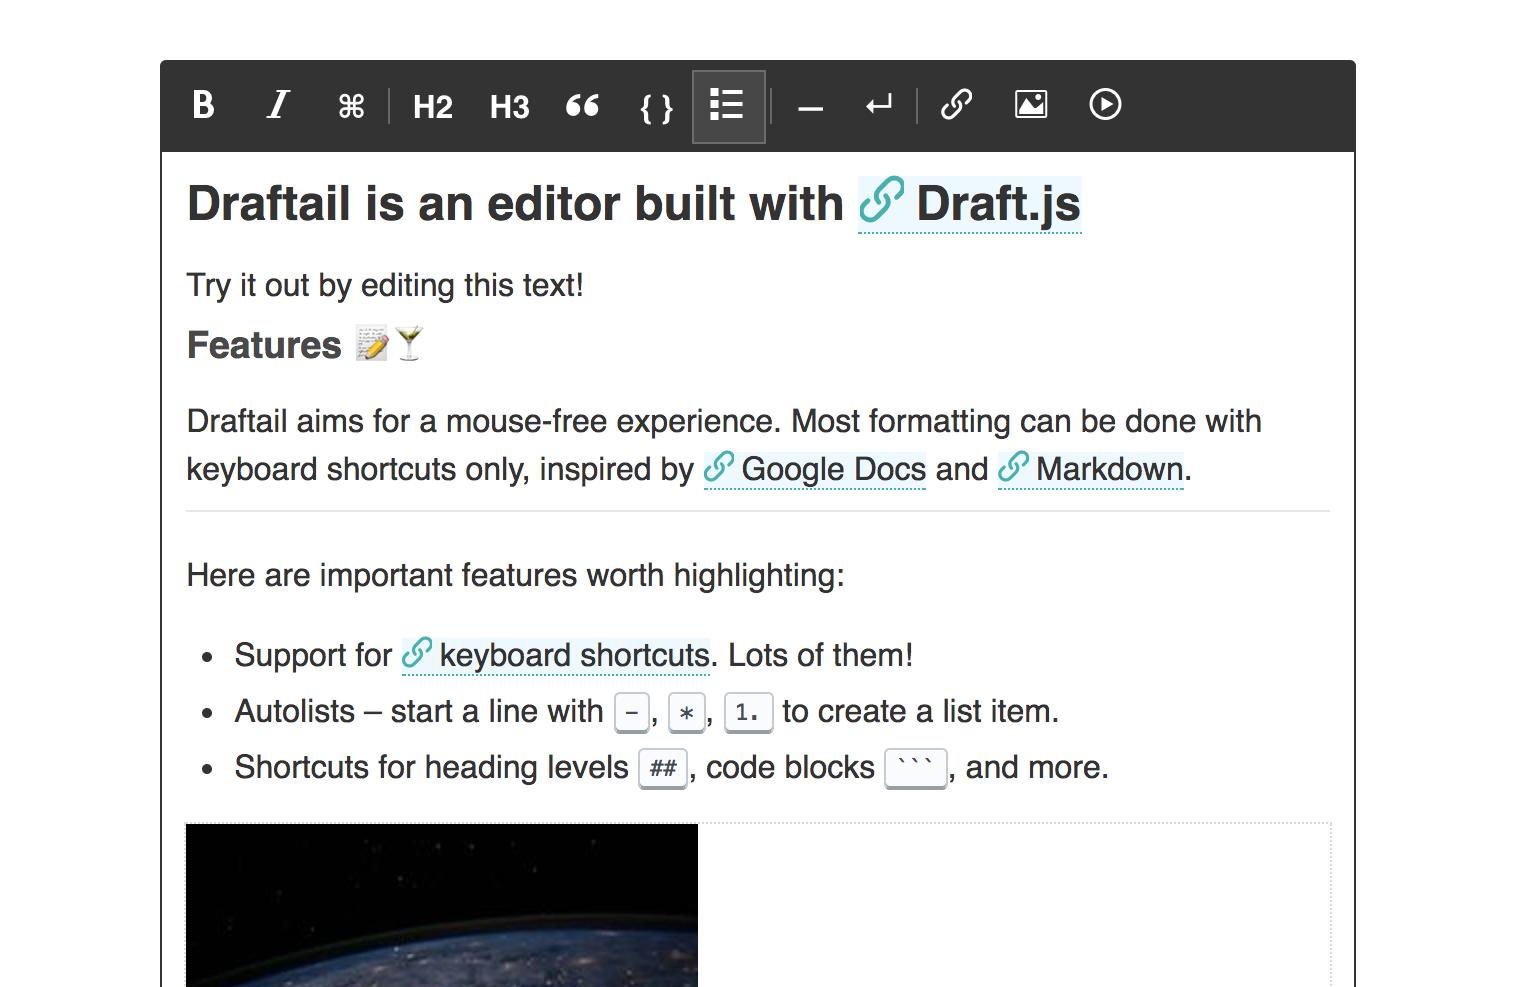 Screenshot of Draftail